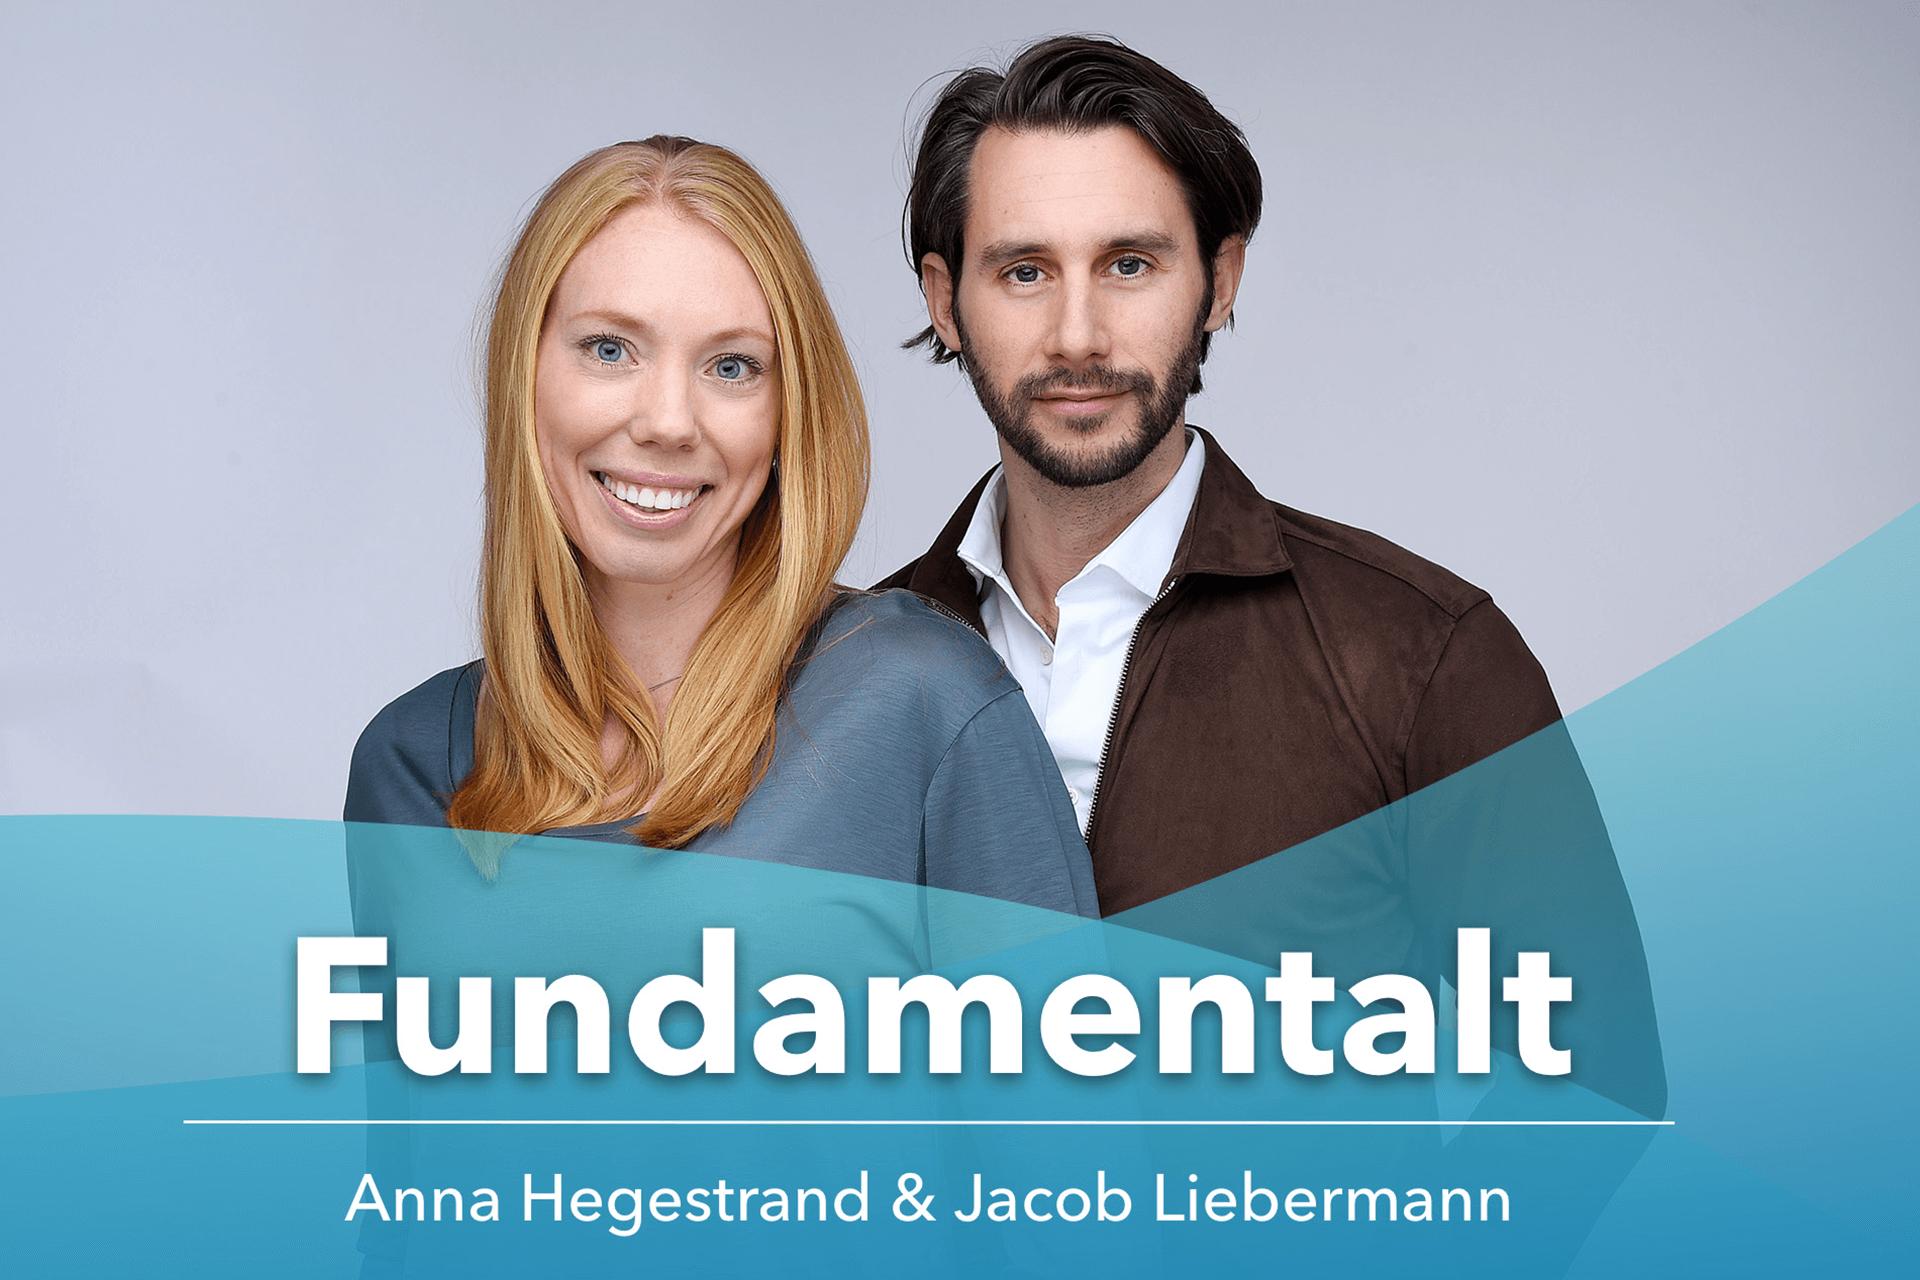 Fundamentalt